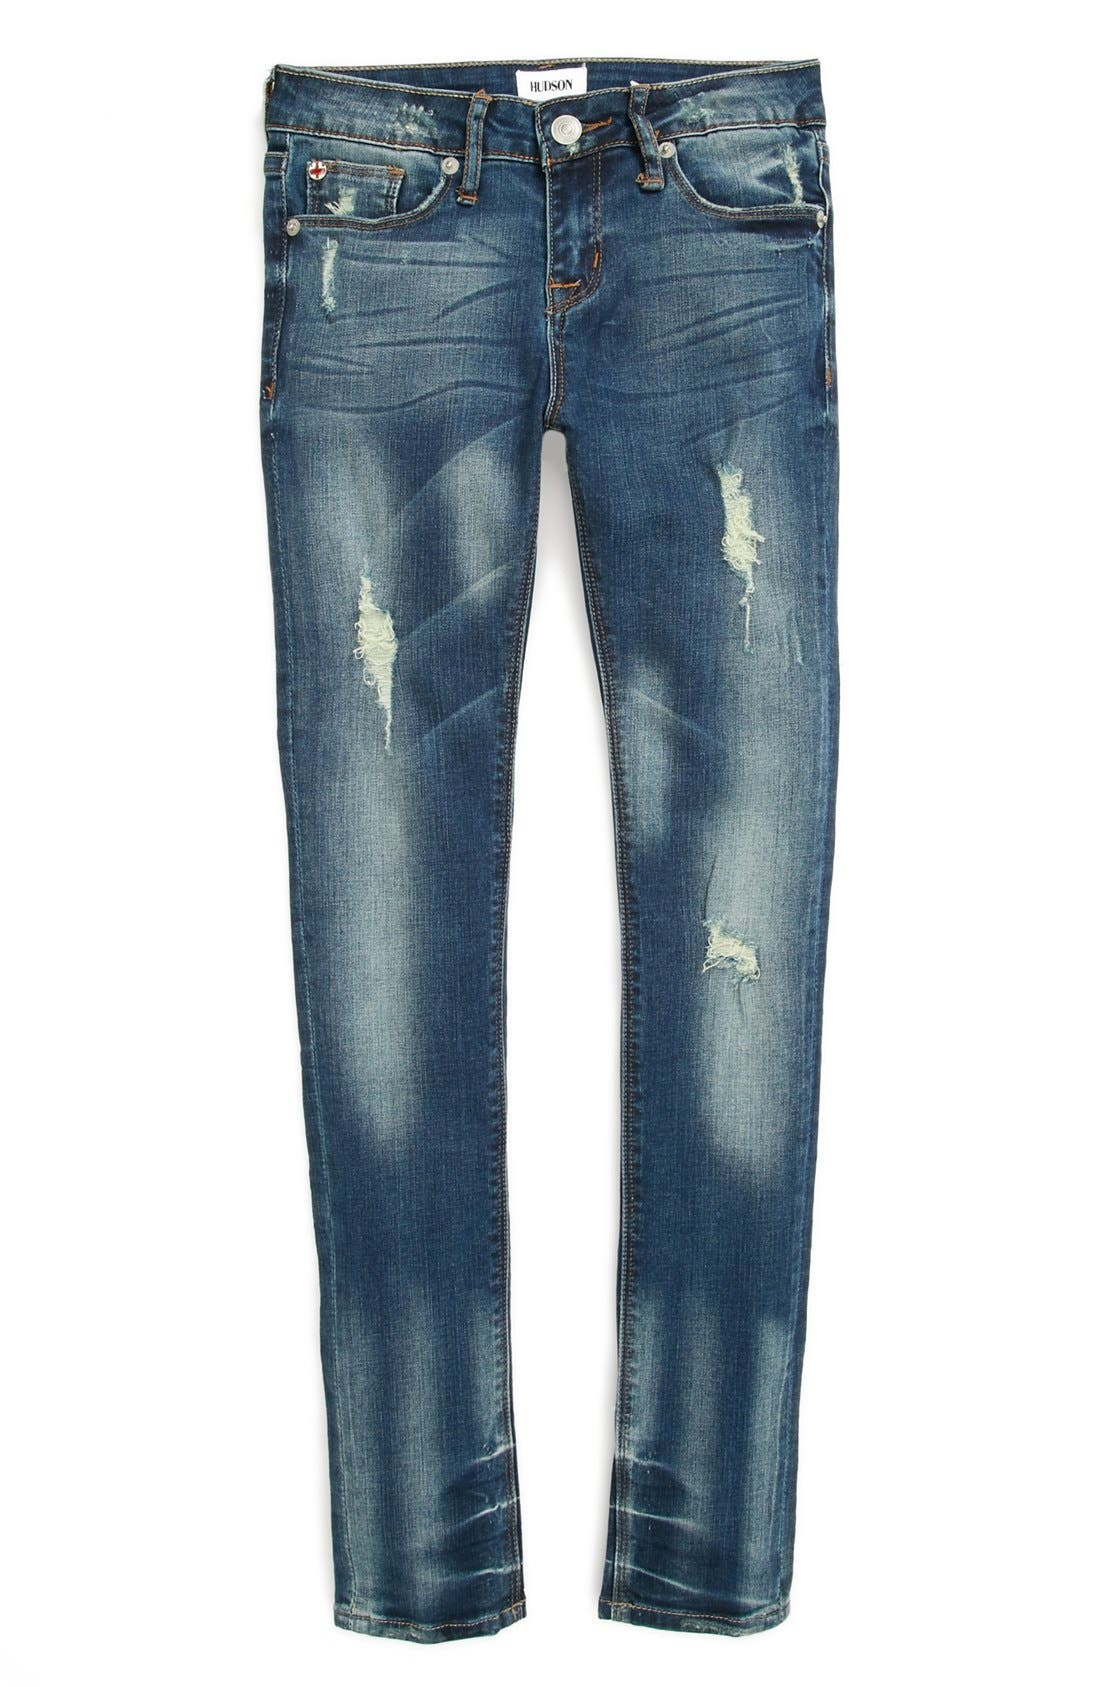 Main Image - Hudson Kids 'Dolly' Skinny Jeans (Big Girls)